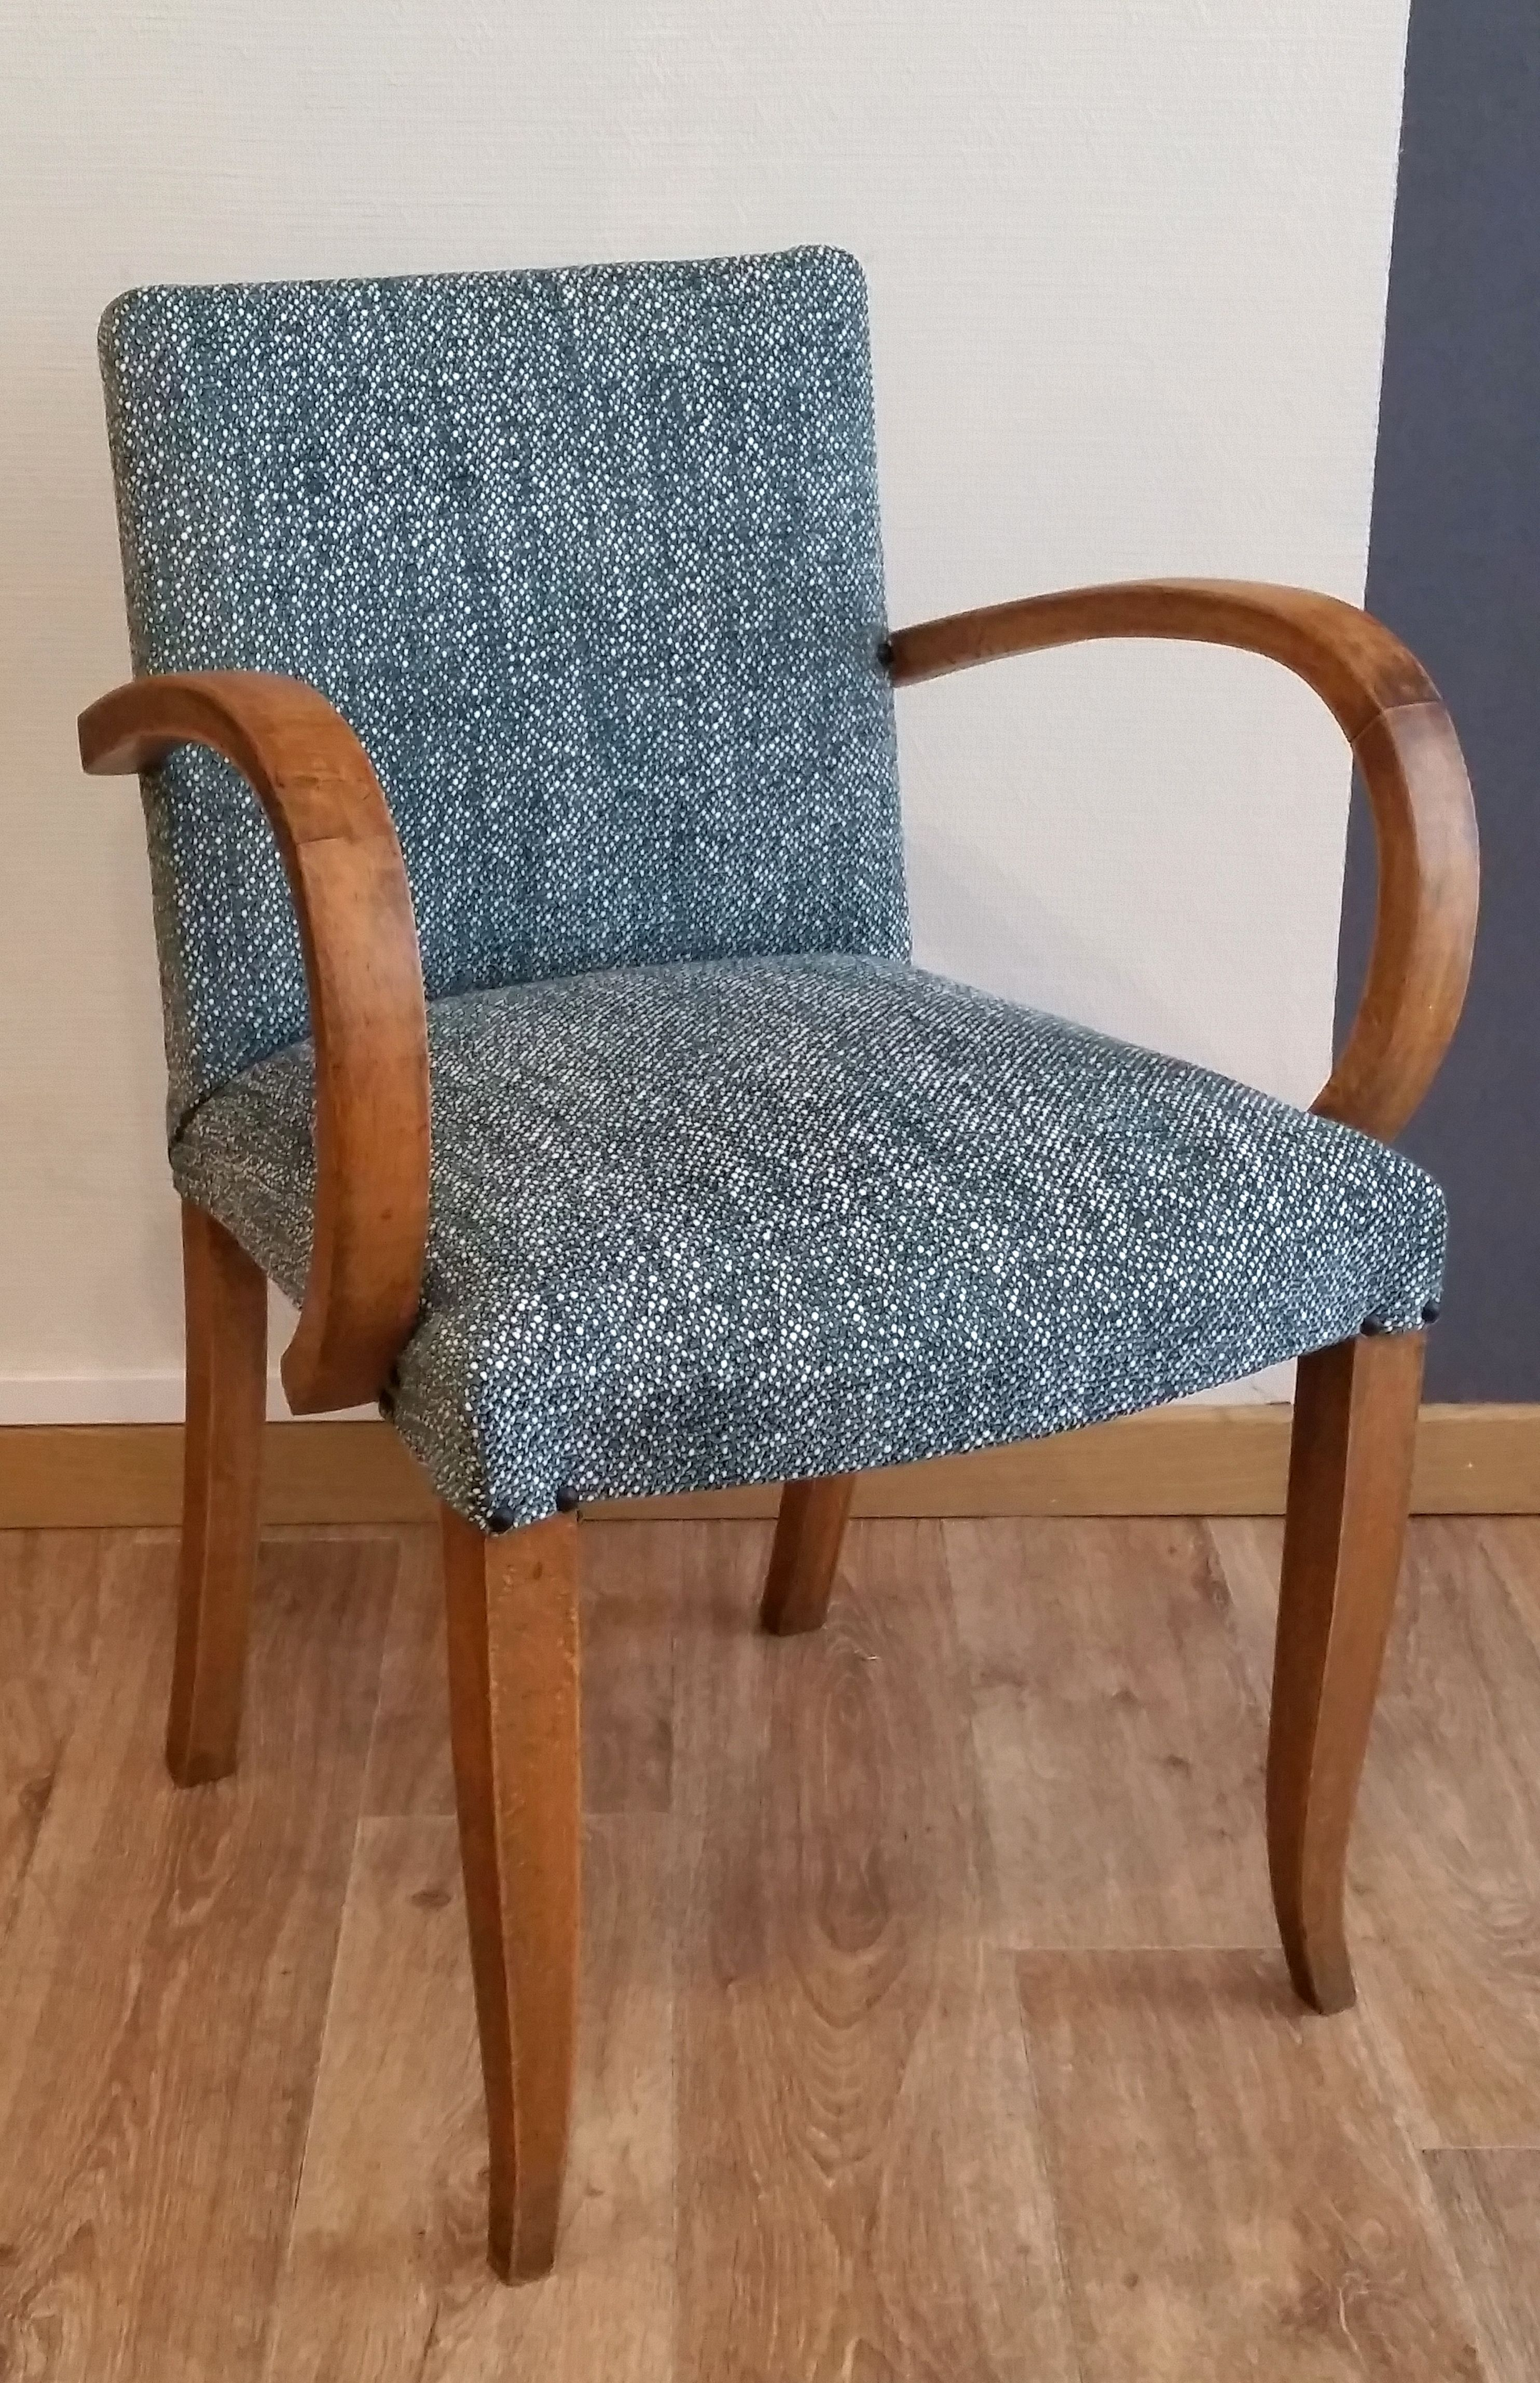 fauteuil bridge tissu casamance bridges pinterest. Black Bedroom Furniture Sets. Home Design Ideas